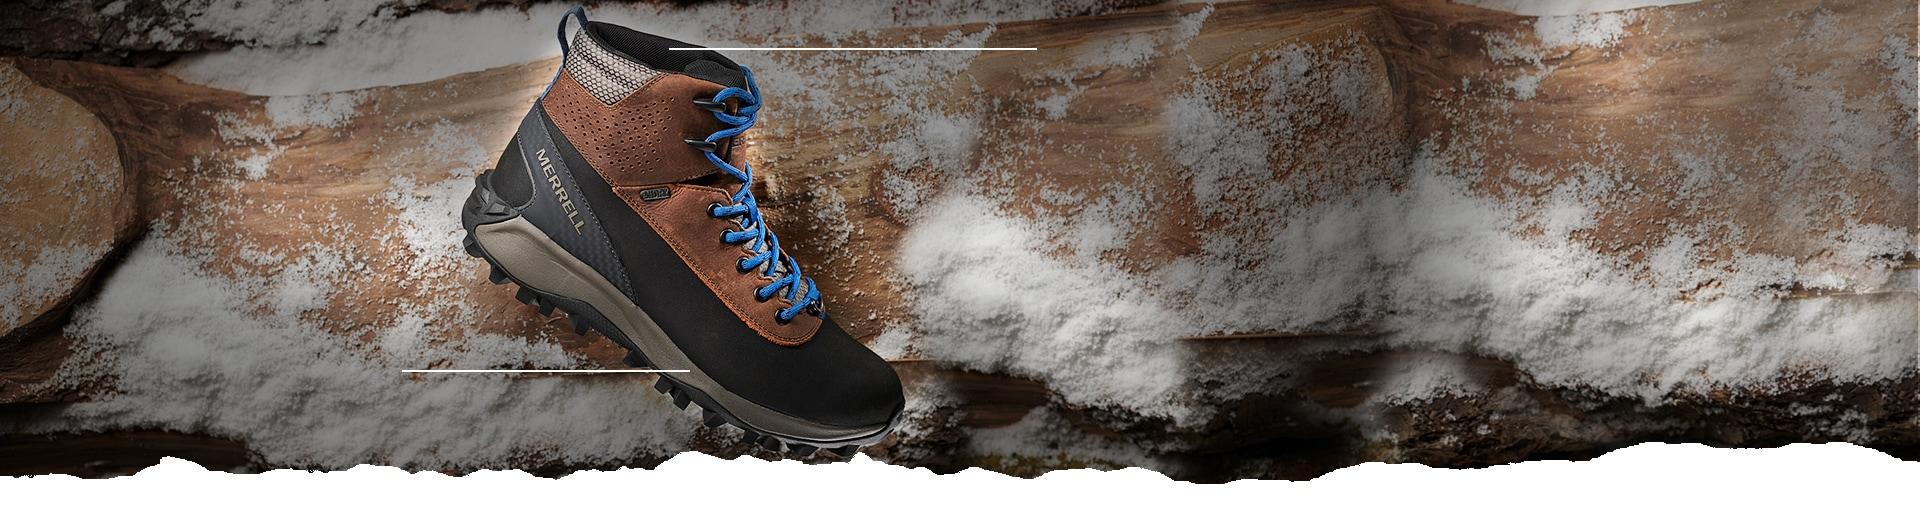 Merrell Kiruna Midshell boot in front of snowy rocks.